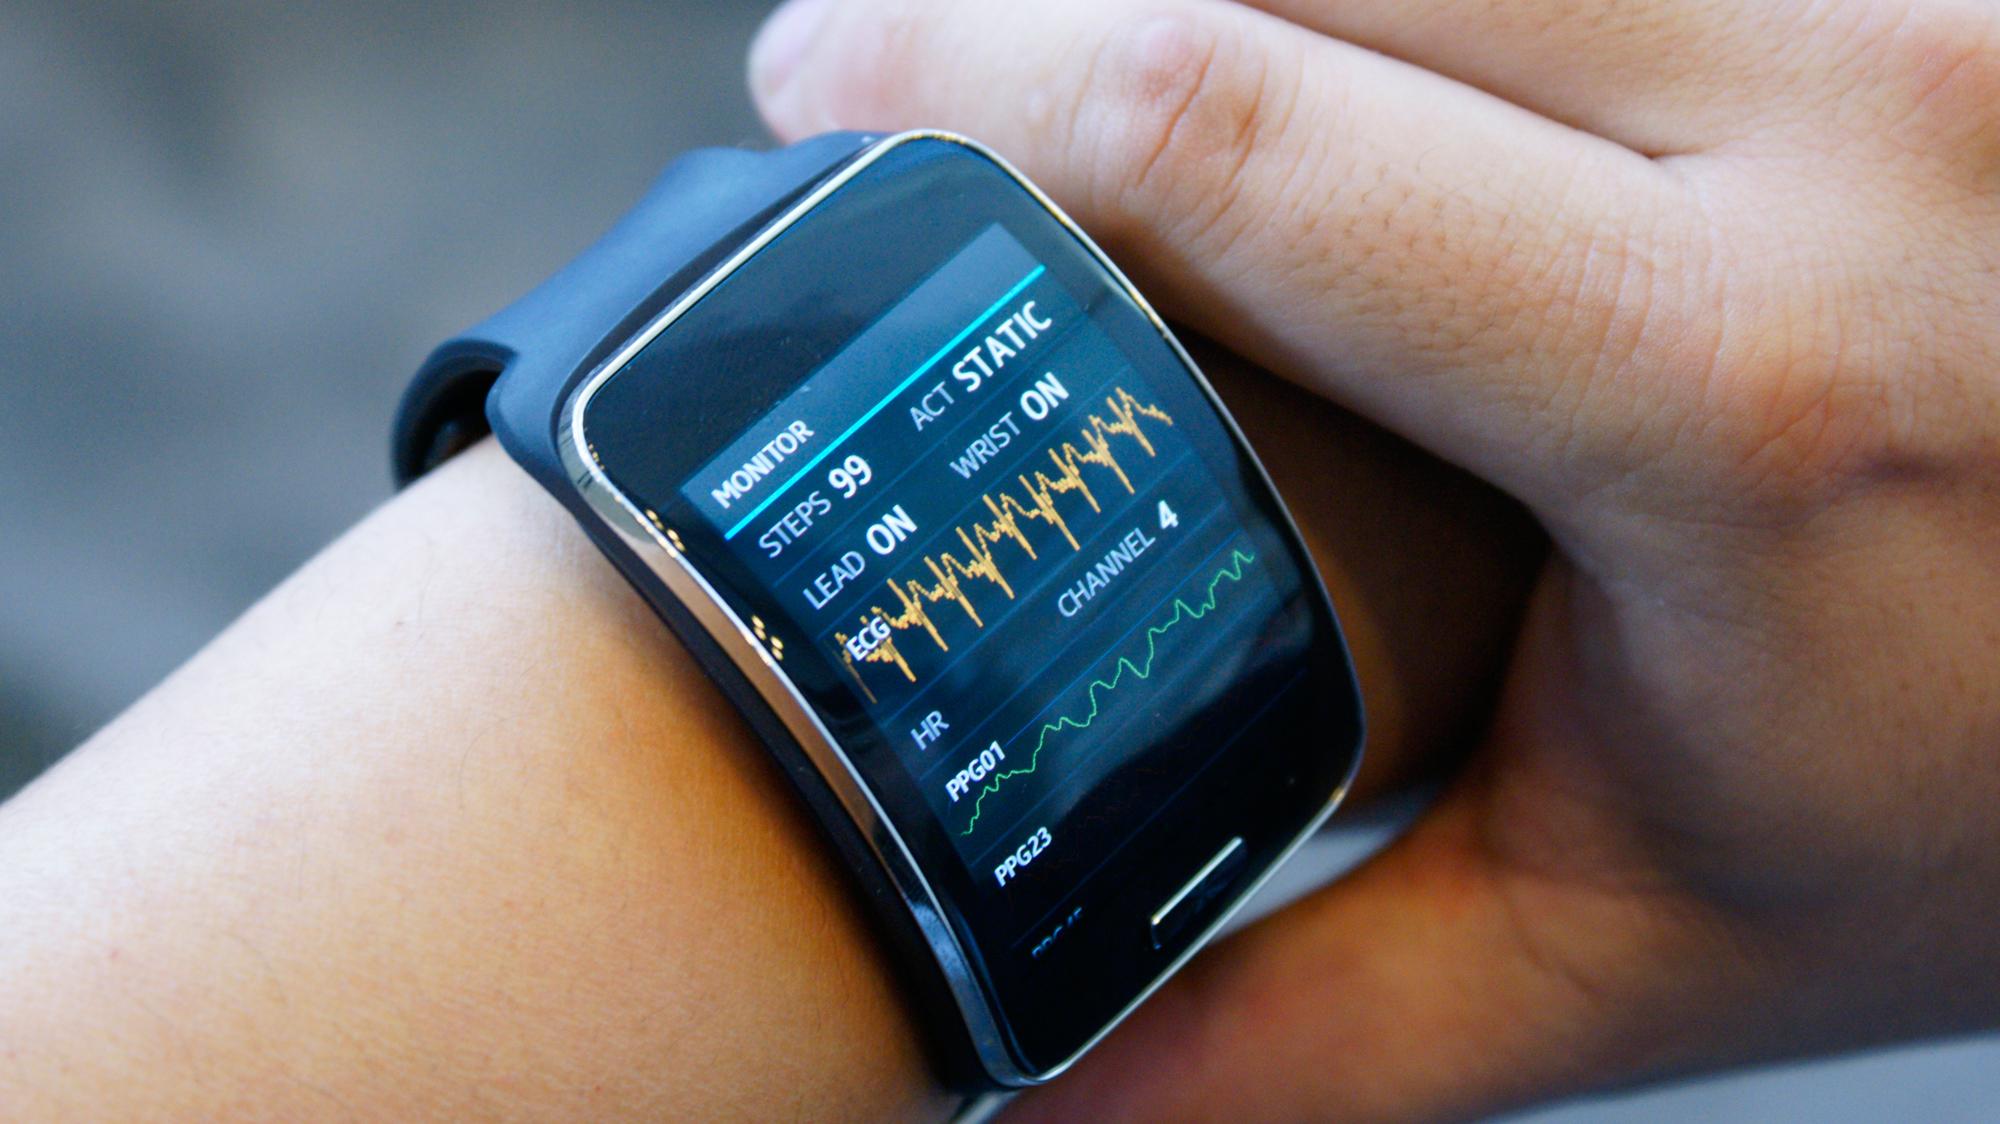 Samsung-Simband-health-tracker-redesign